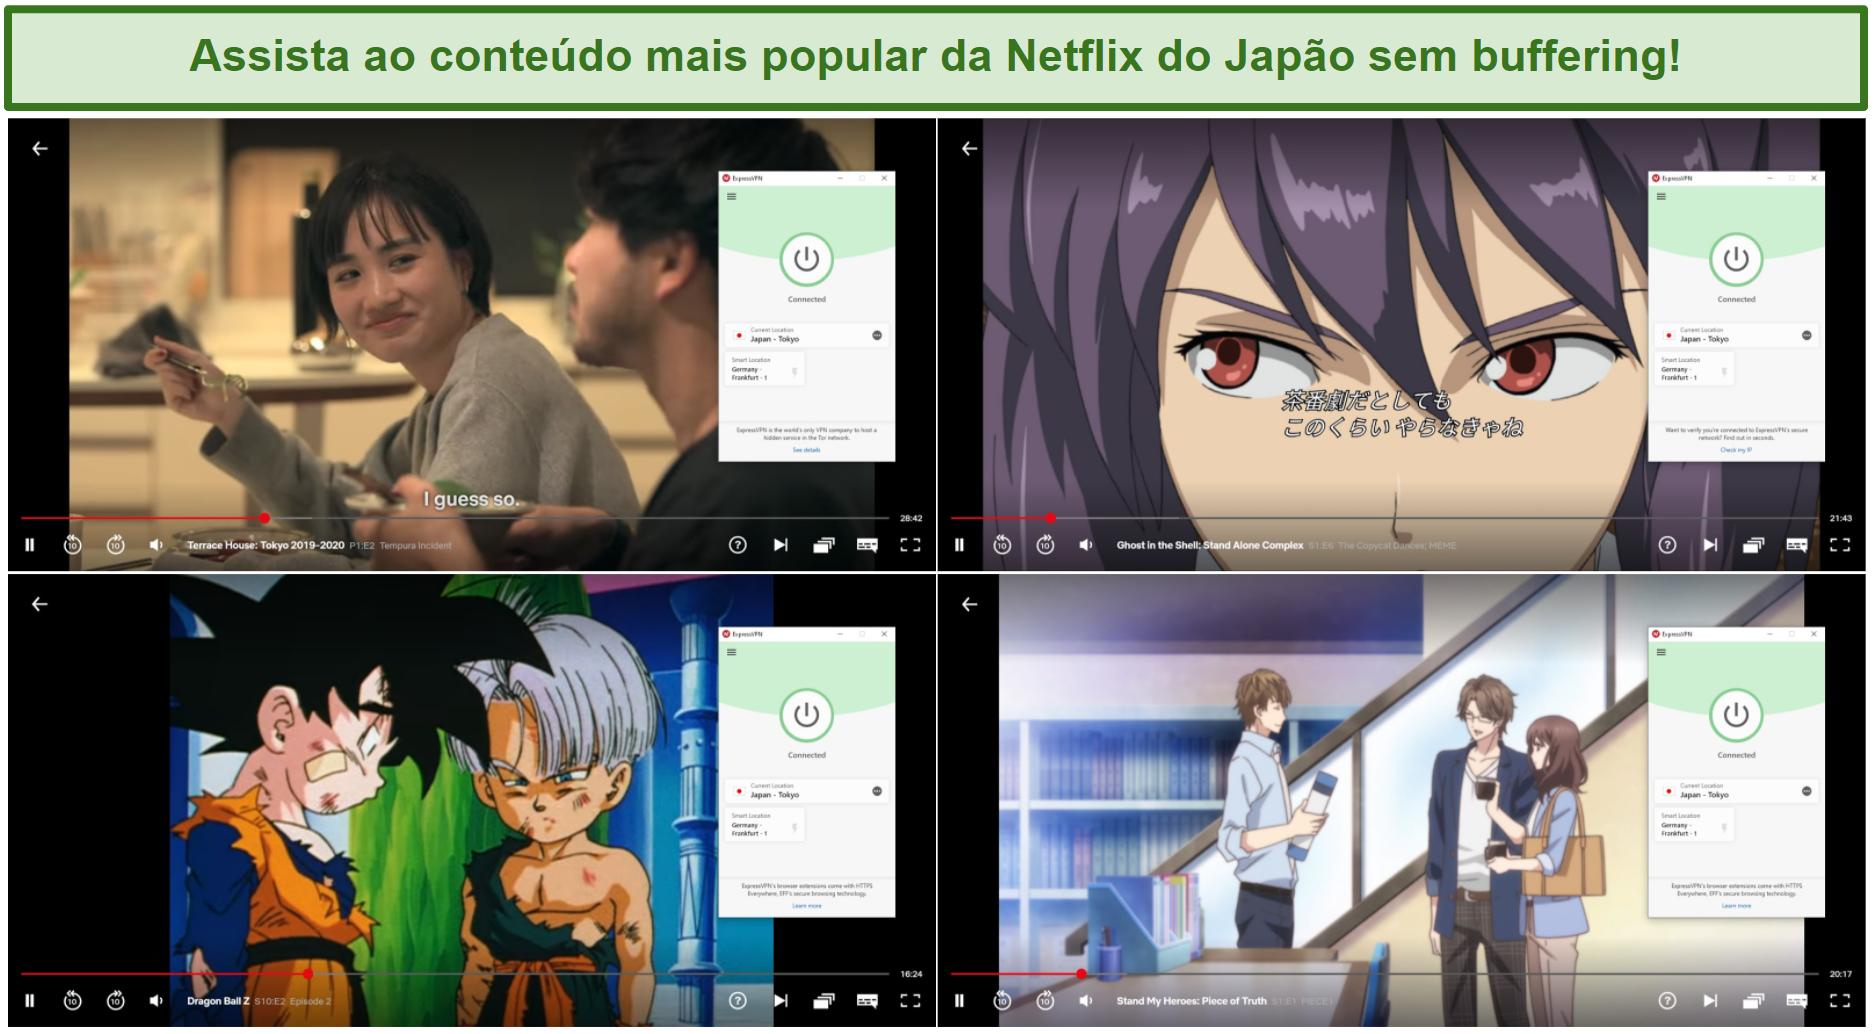 Captura de tela do streaming do ExpressVPN Terrace House: Tóquio, Ghost in the Shell: Stand Alone Complex, Dragon Ball Z e Stand My Heroes: Piece of Truth da Netflix Japan